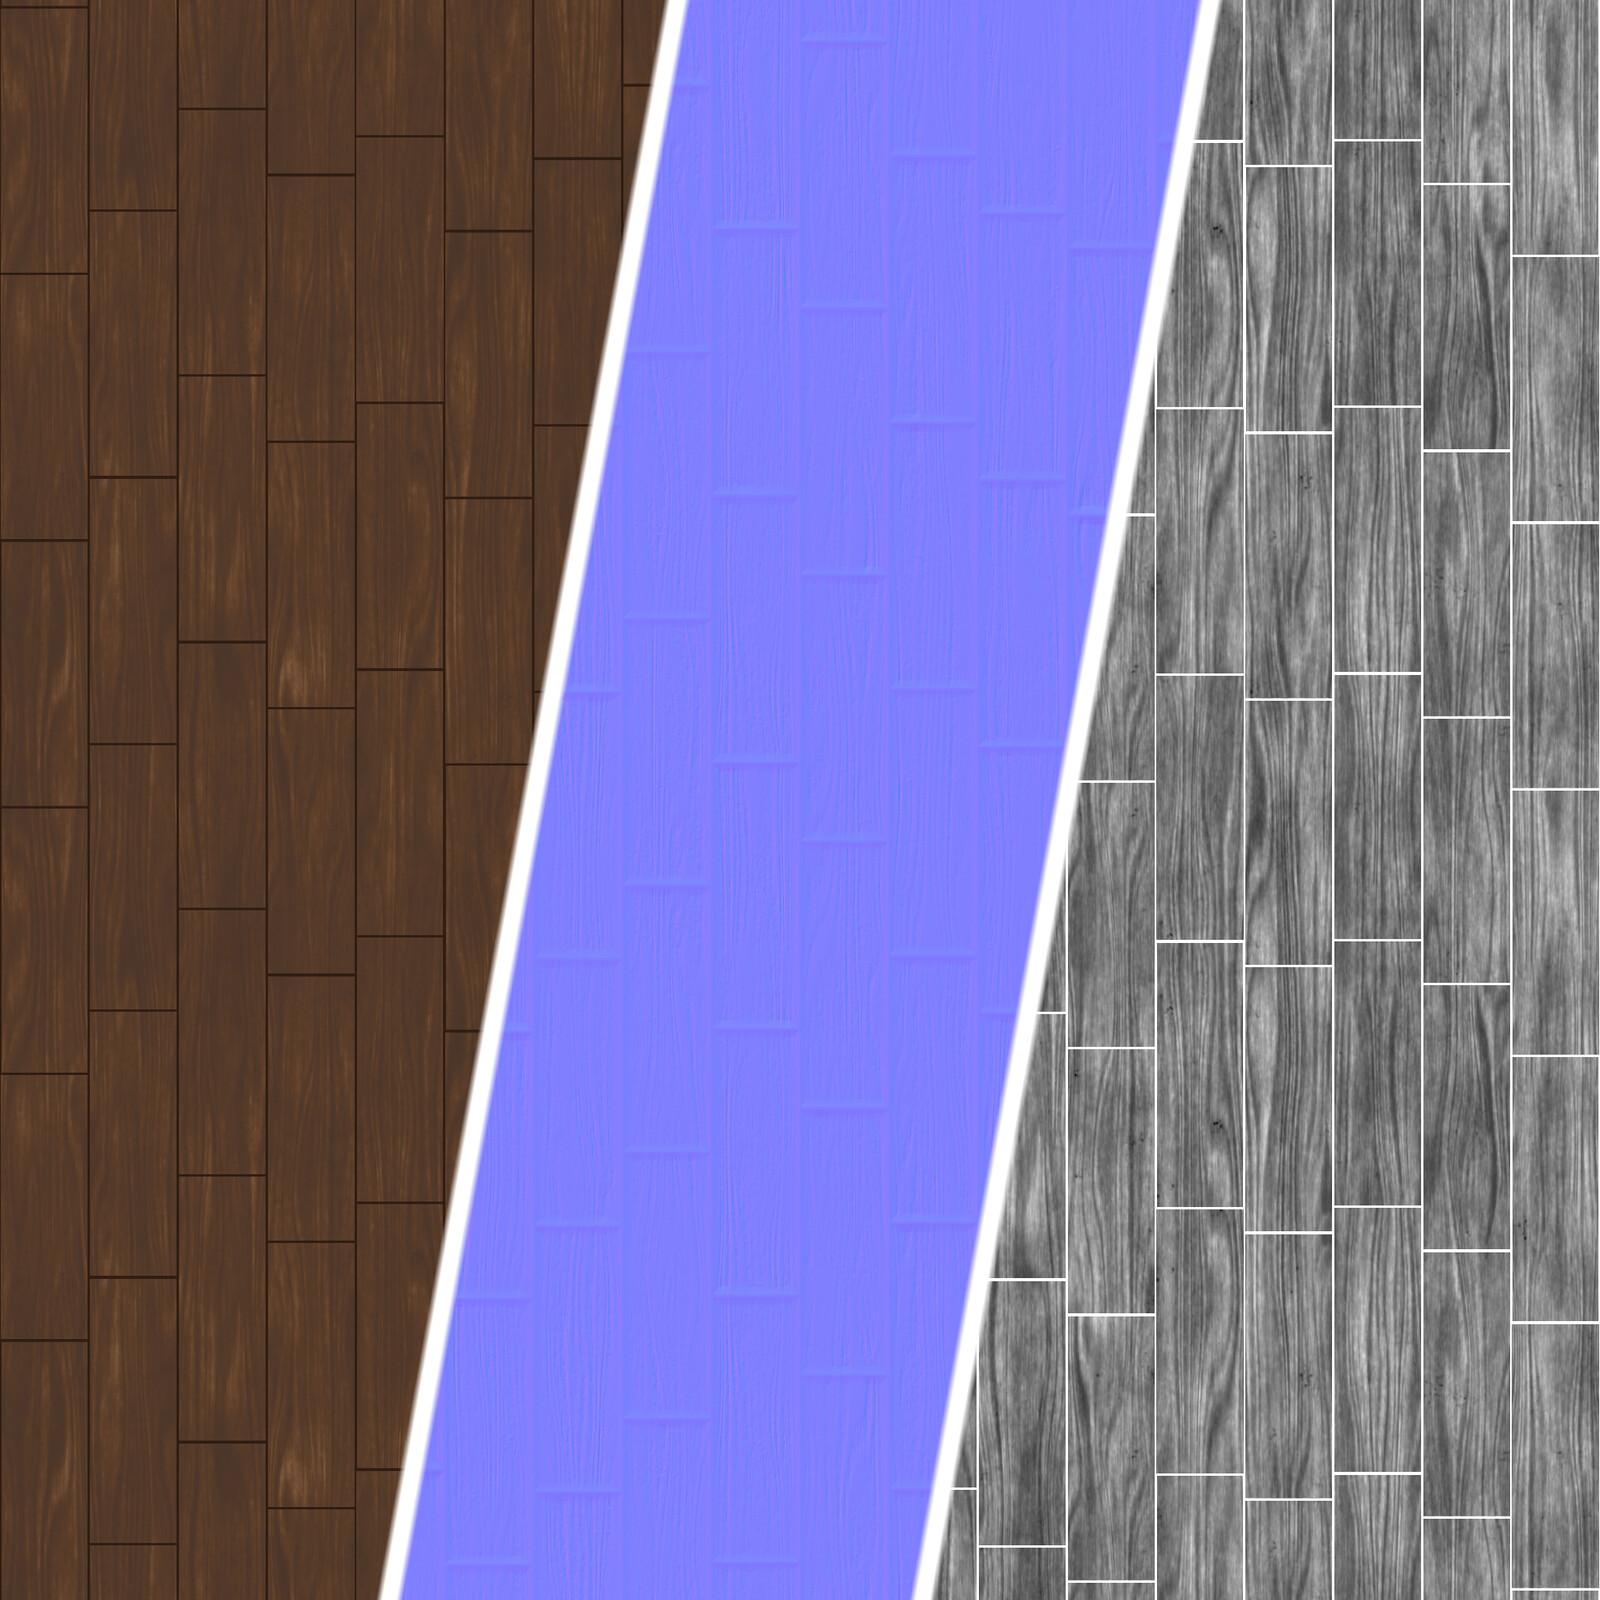 Smooth Wood Board texture maps breakdown